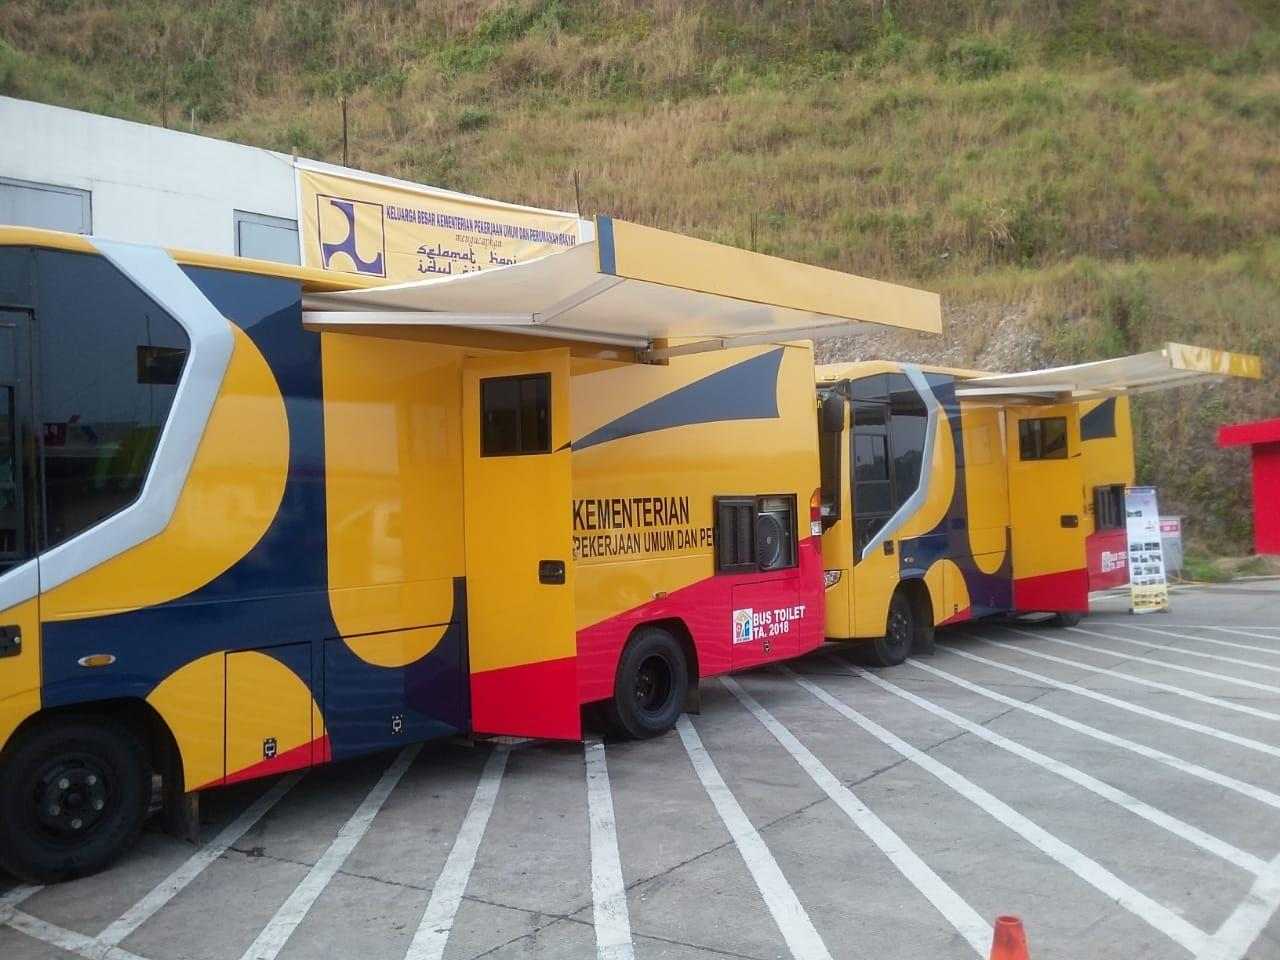 Ada 26 Unit Mobil Toilet di Tol Trans Jawa, Bikin Mudik Makin Asyik